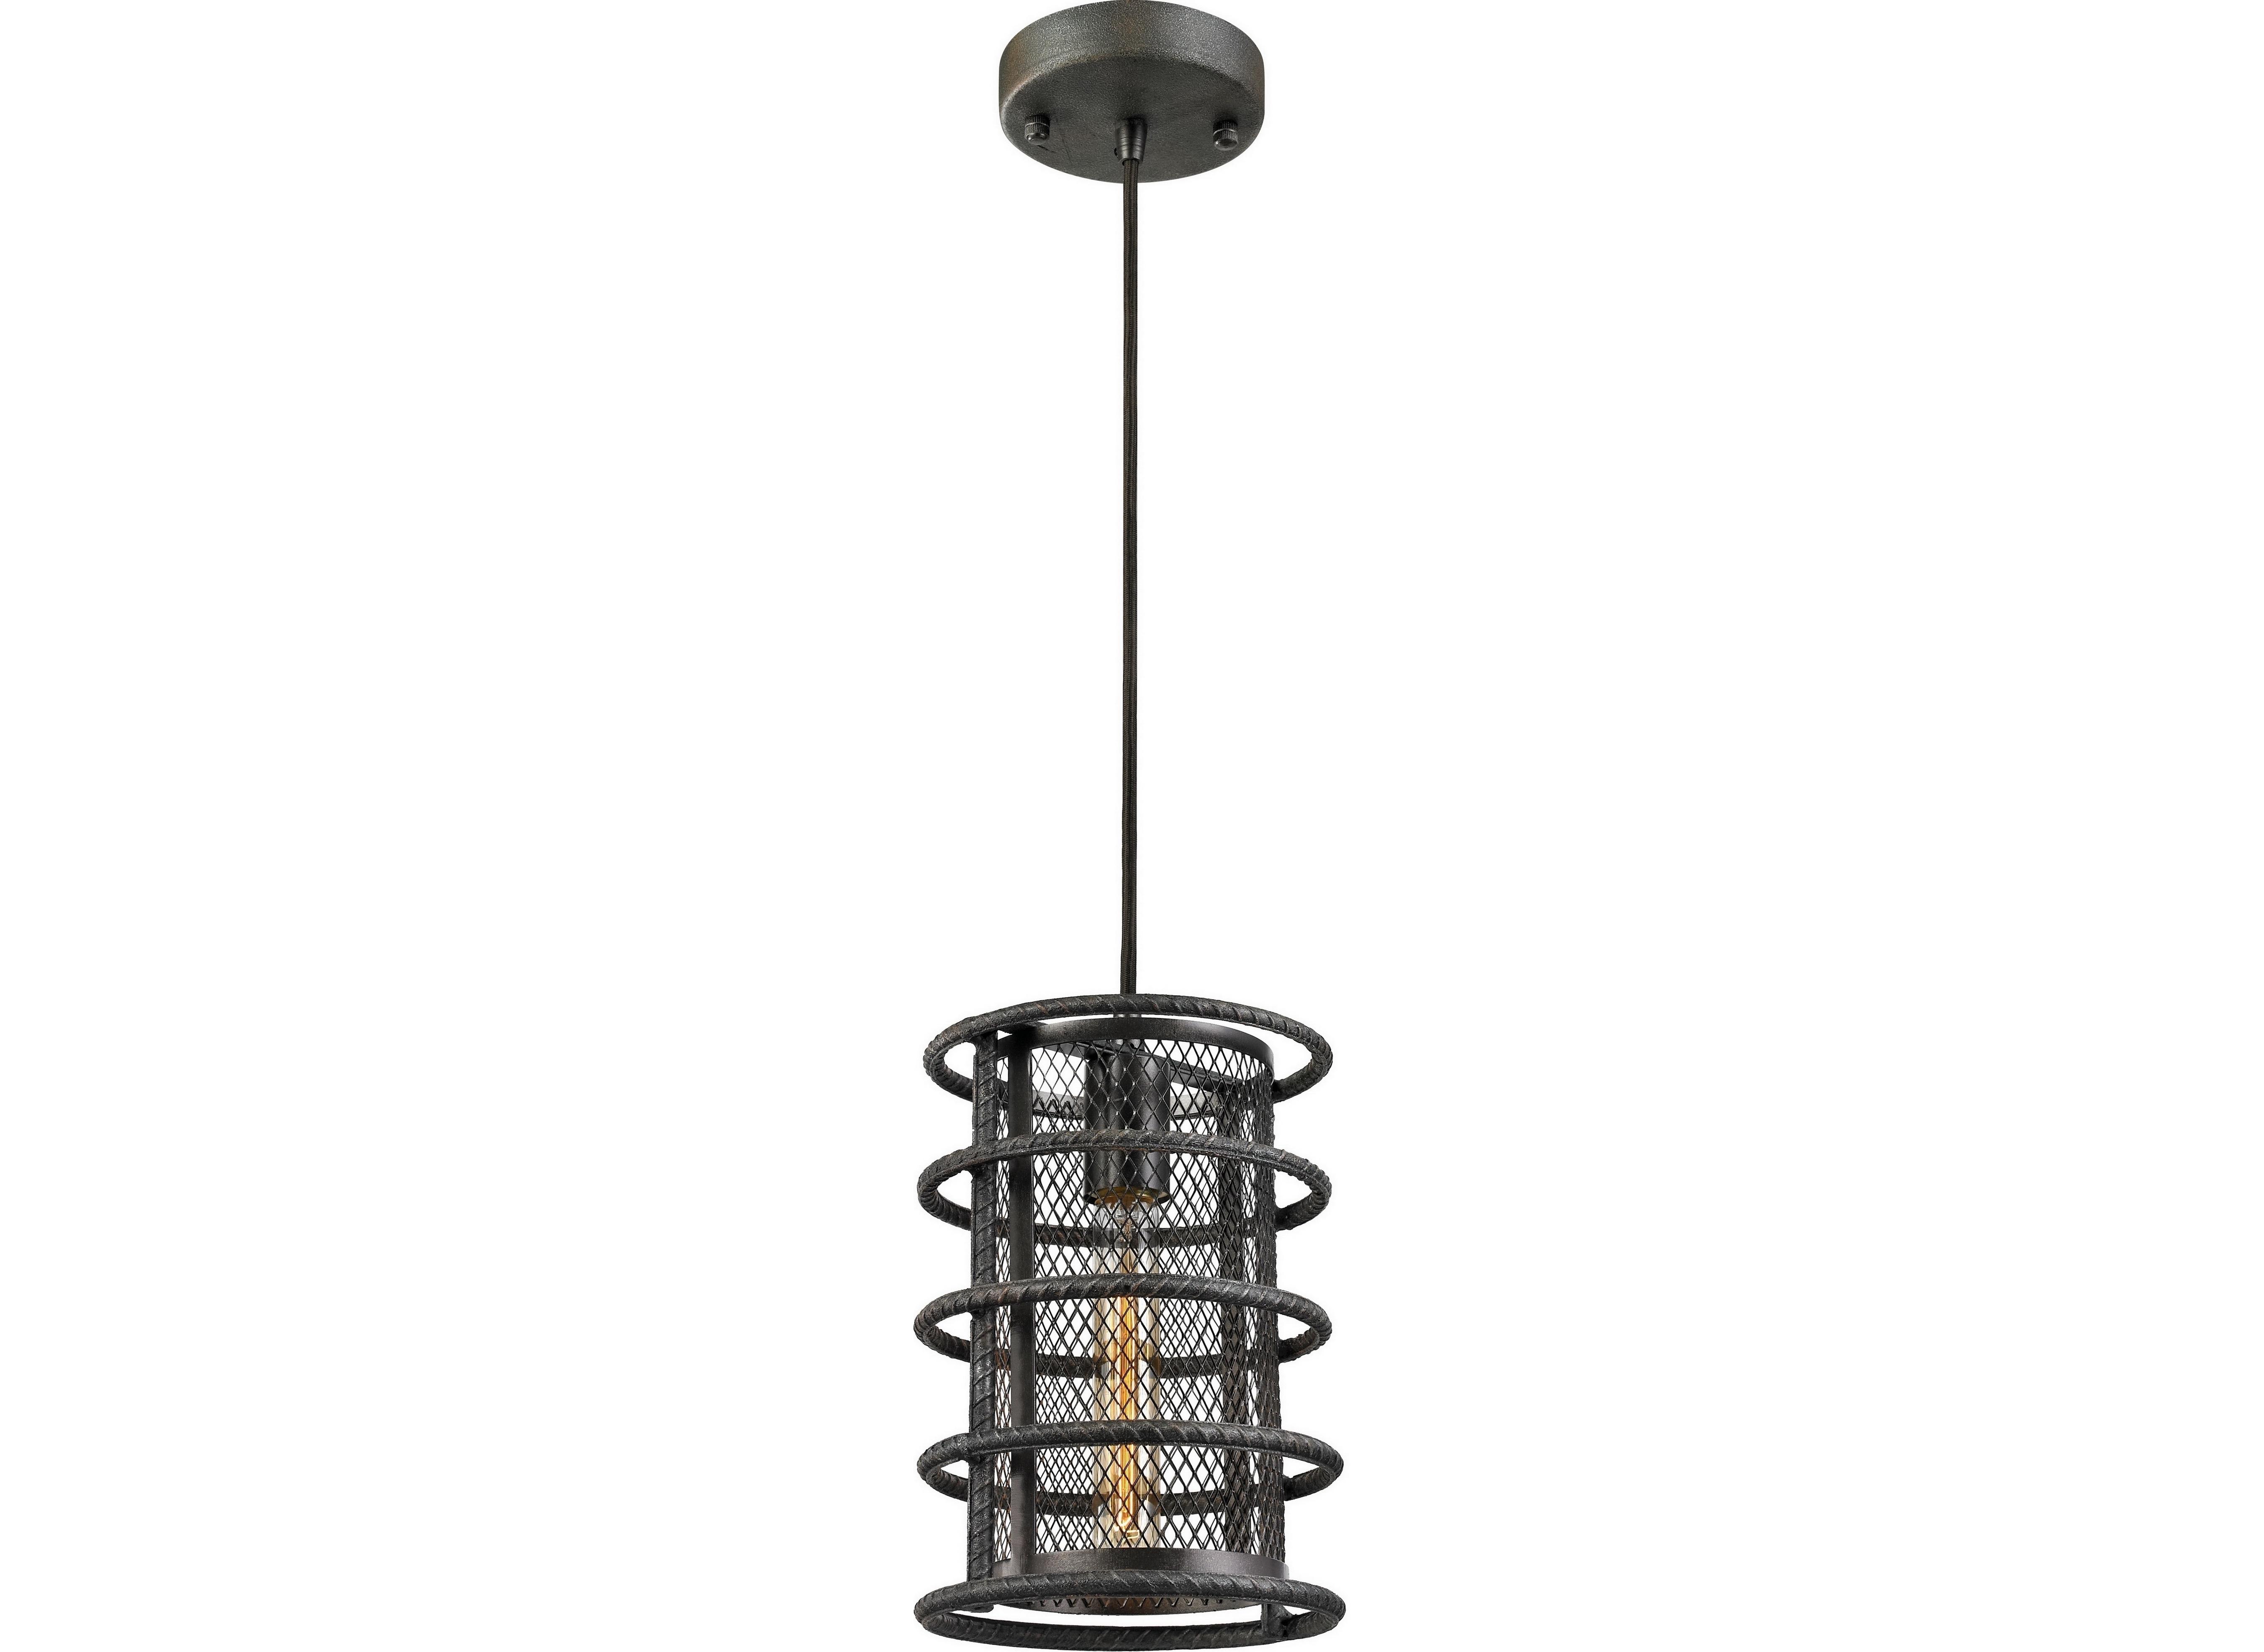 Подвесной светильникПодвесные светильники<br>&amp;lt;div&amp;gt;Цоколь: E27&amp;lt;/div&amp;gt;&amp;lt;div&amp;gt;Мощность ламп: 60W&amp;lt;/div&amp;gt;&amp;lt;div&amp;gt;Количество лампочек: 1&amp;lt;/div&amp;gt;<br><br>Material: Металл<br>Height см: 130<br>Diameter см: 18